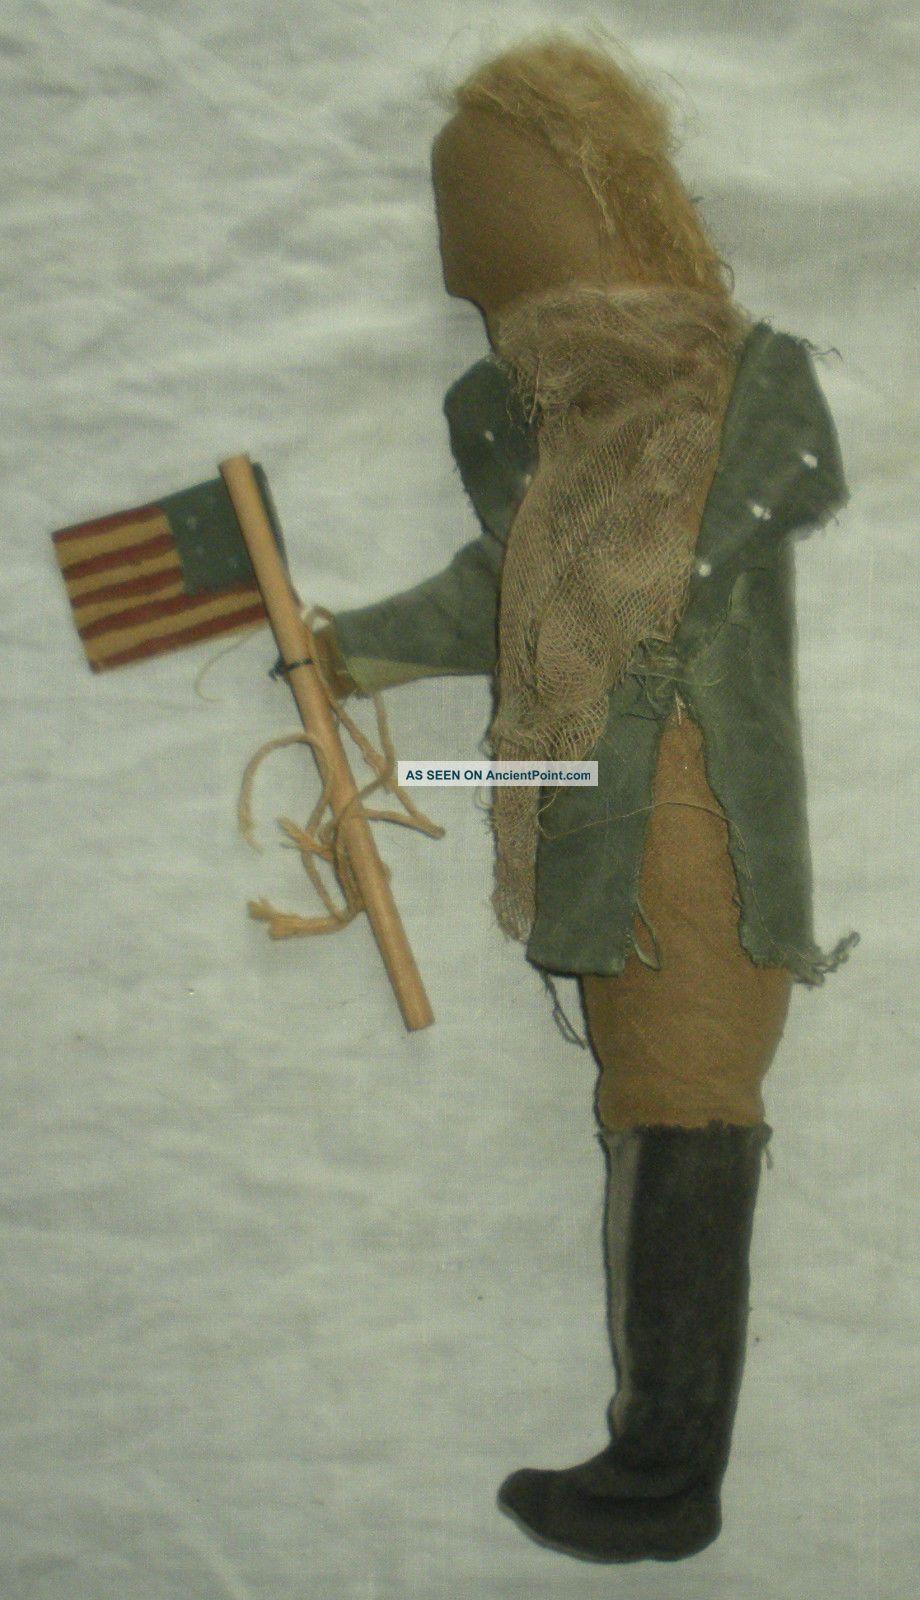 Primitive George Washington Continental Soldier Revolutionary War Doll Flag Vafo Primitives photo